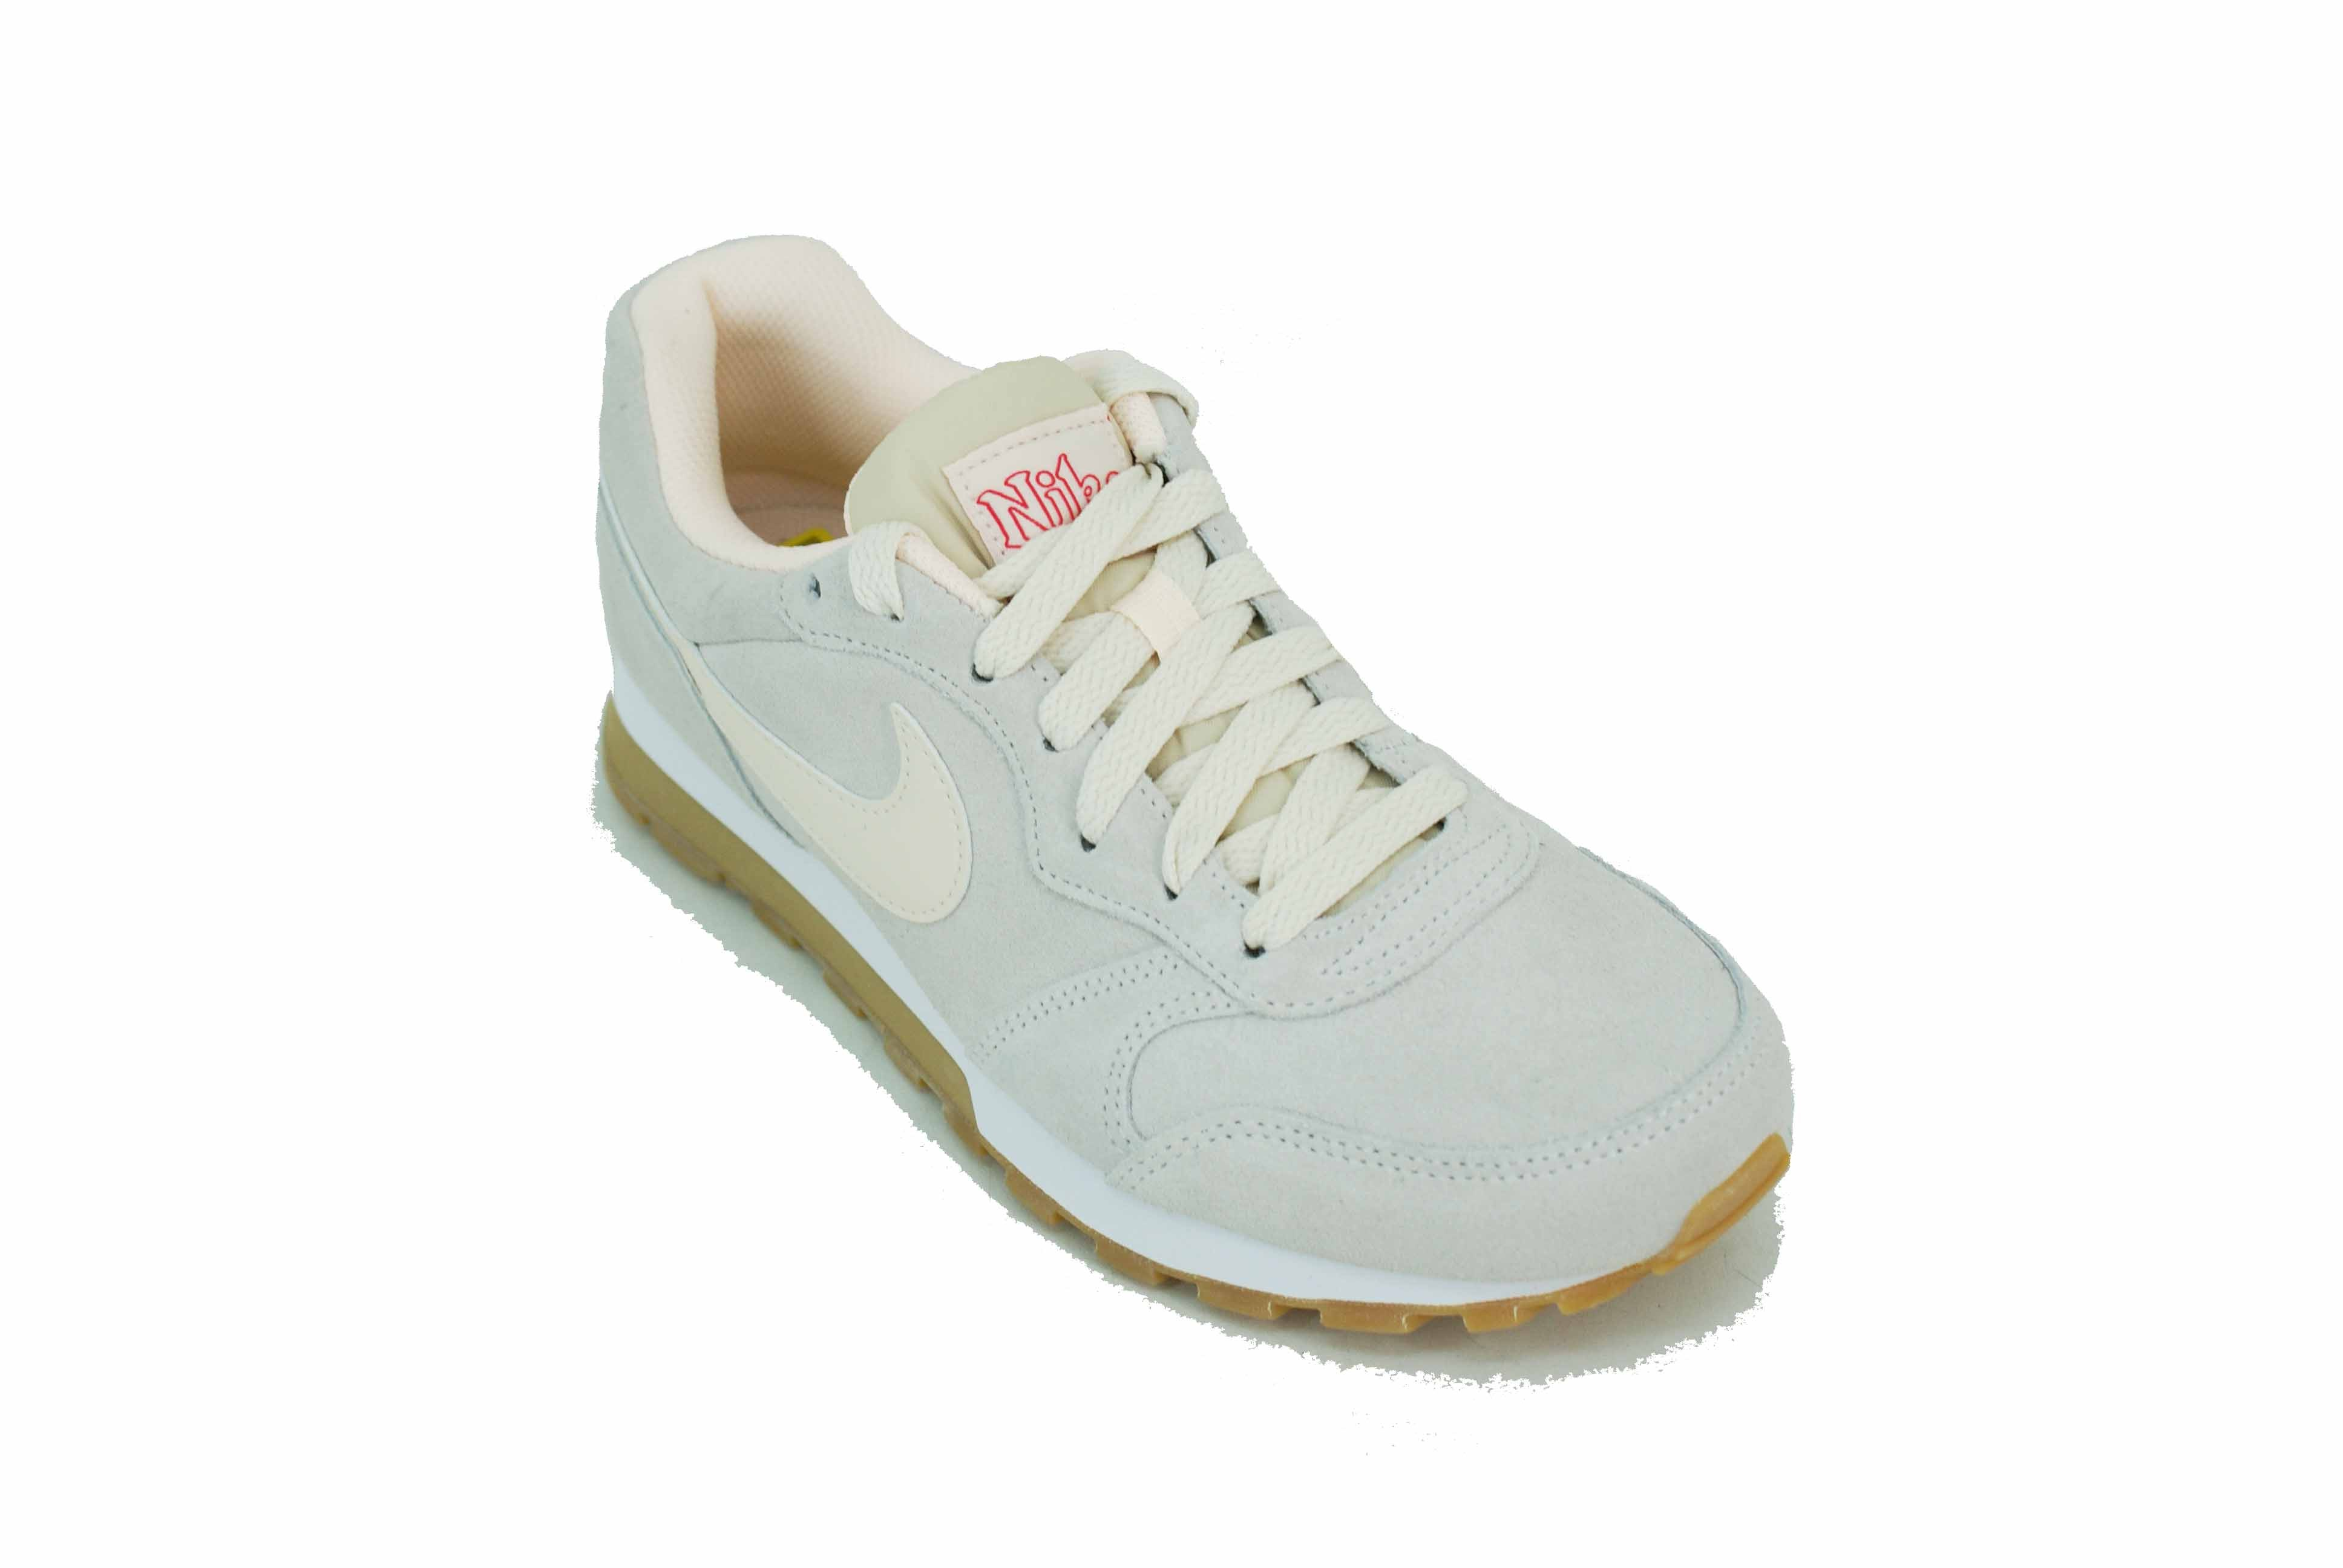 Runner Zapatilla Nike Zapatillas Dama Deporfan 2 Md Beigerosa eBdxoC